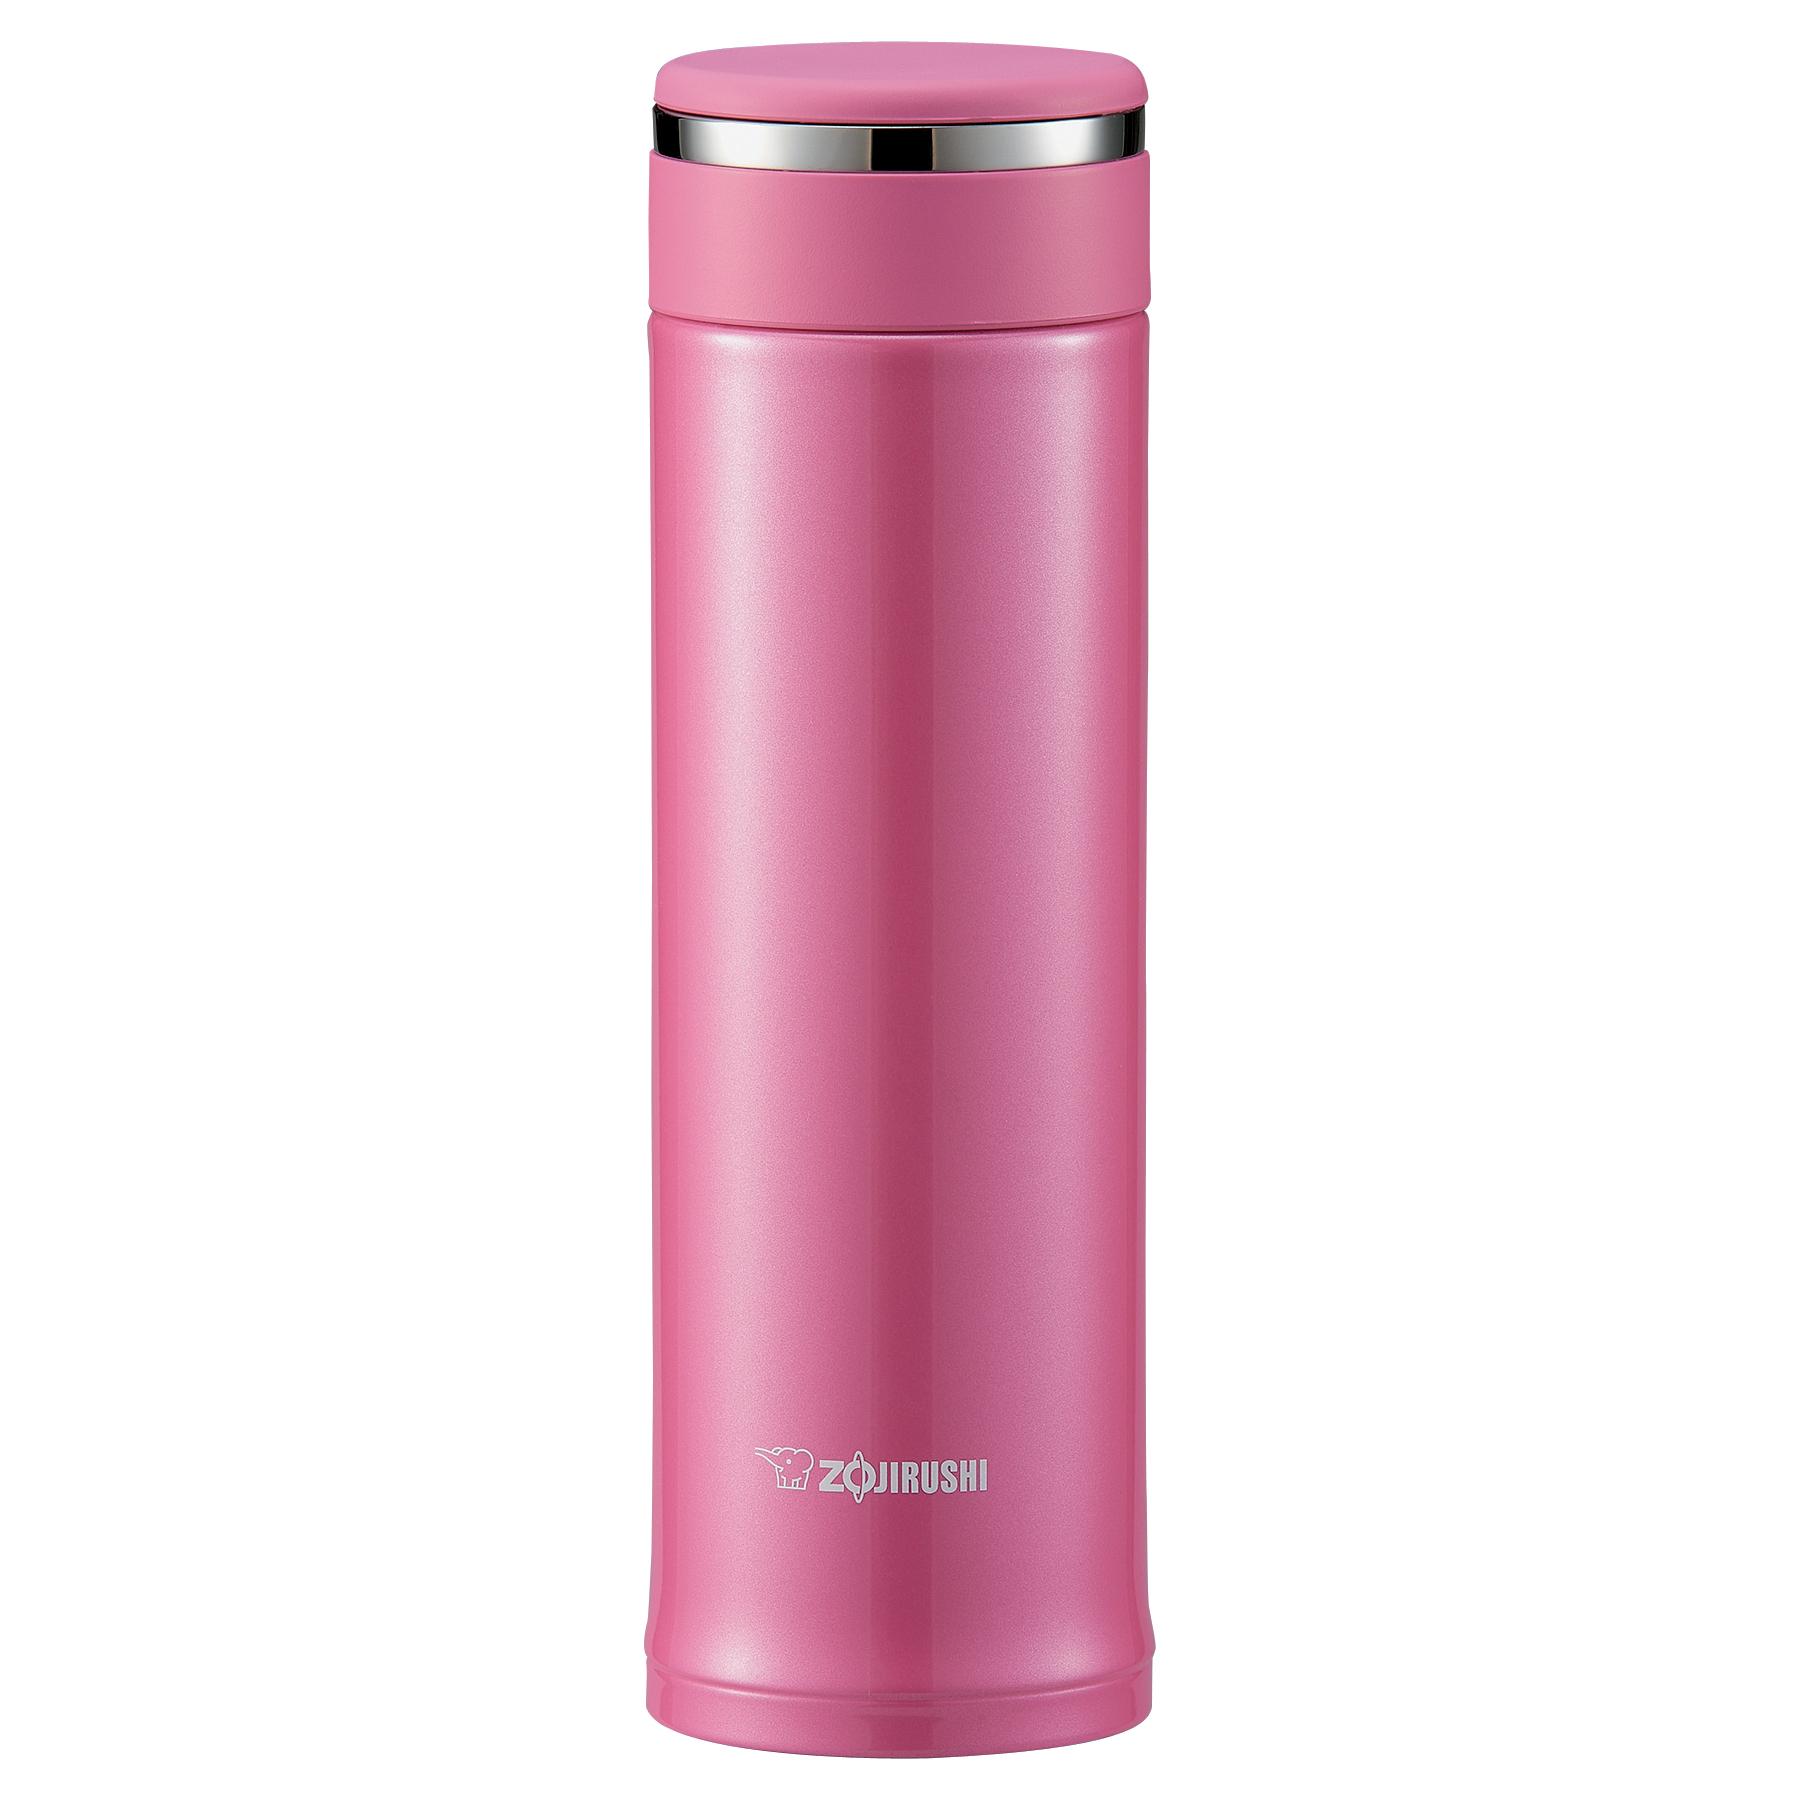 Zojirushi Tuff Pink Stainless Steel 16 Ounce Mug